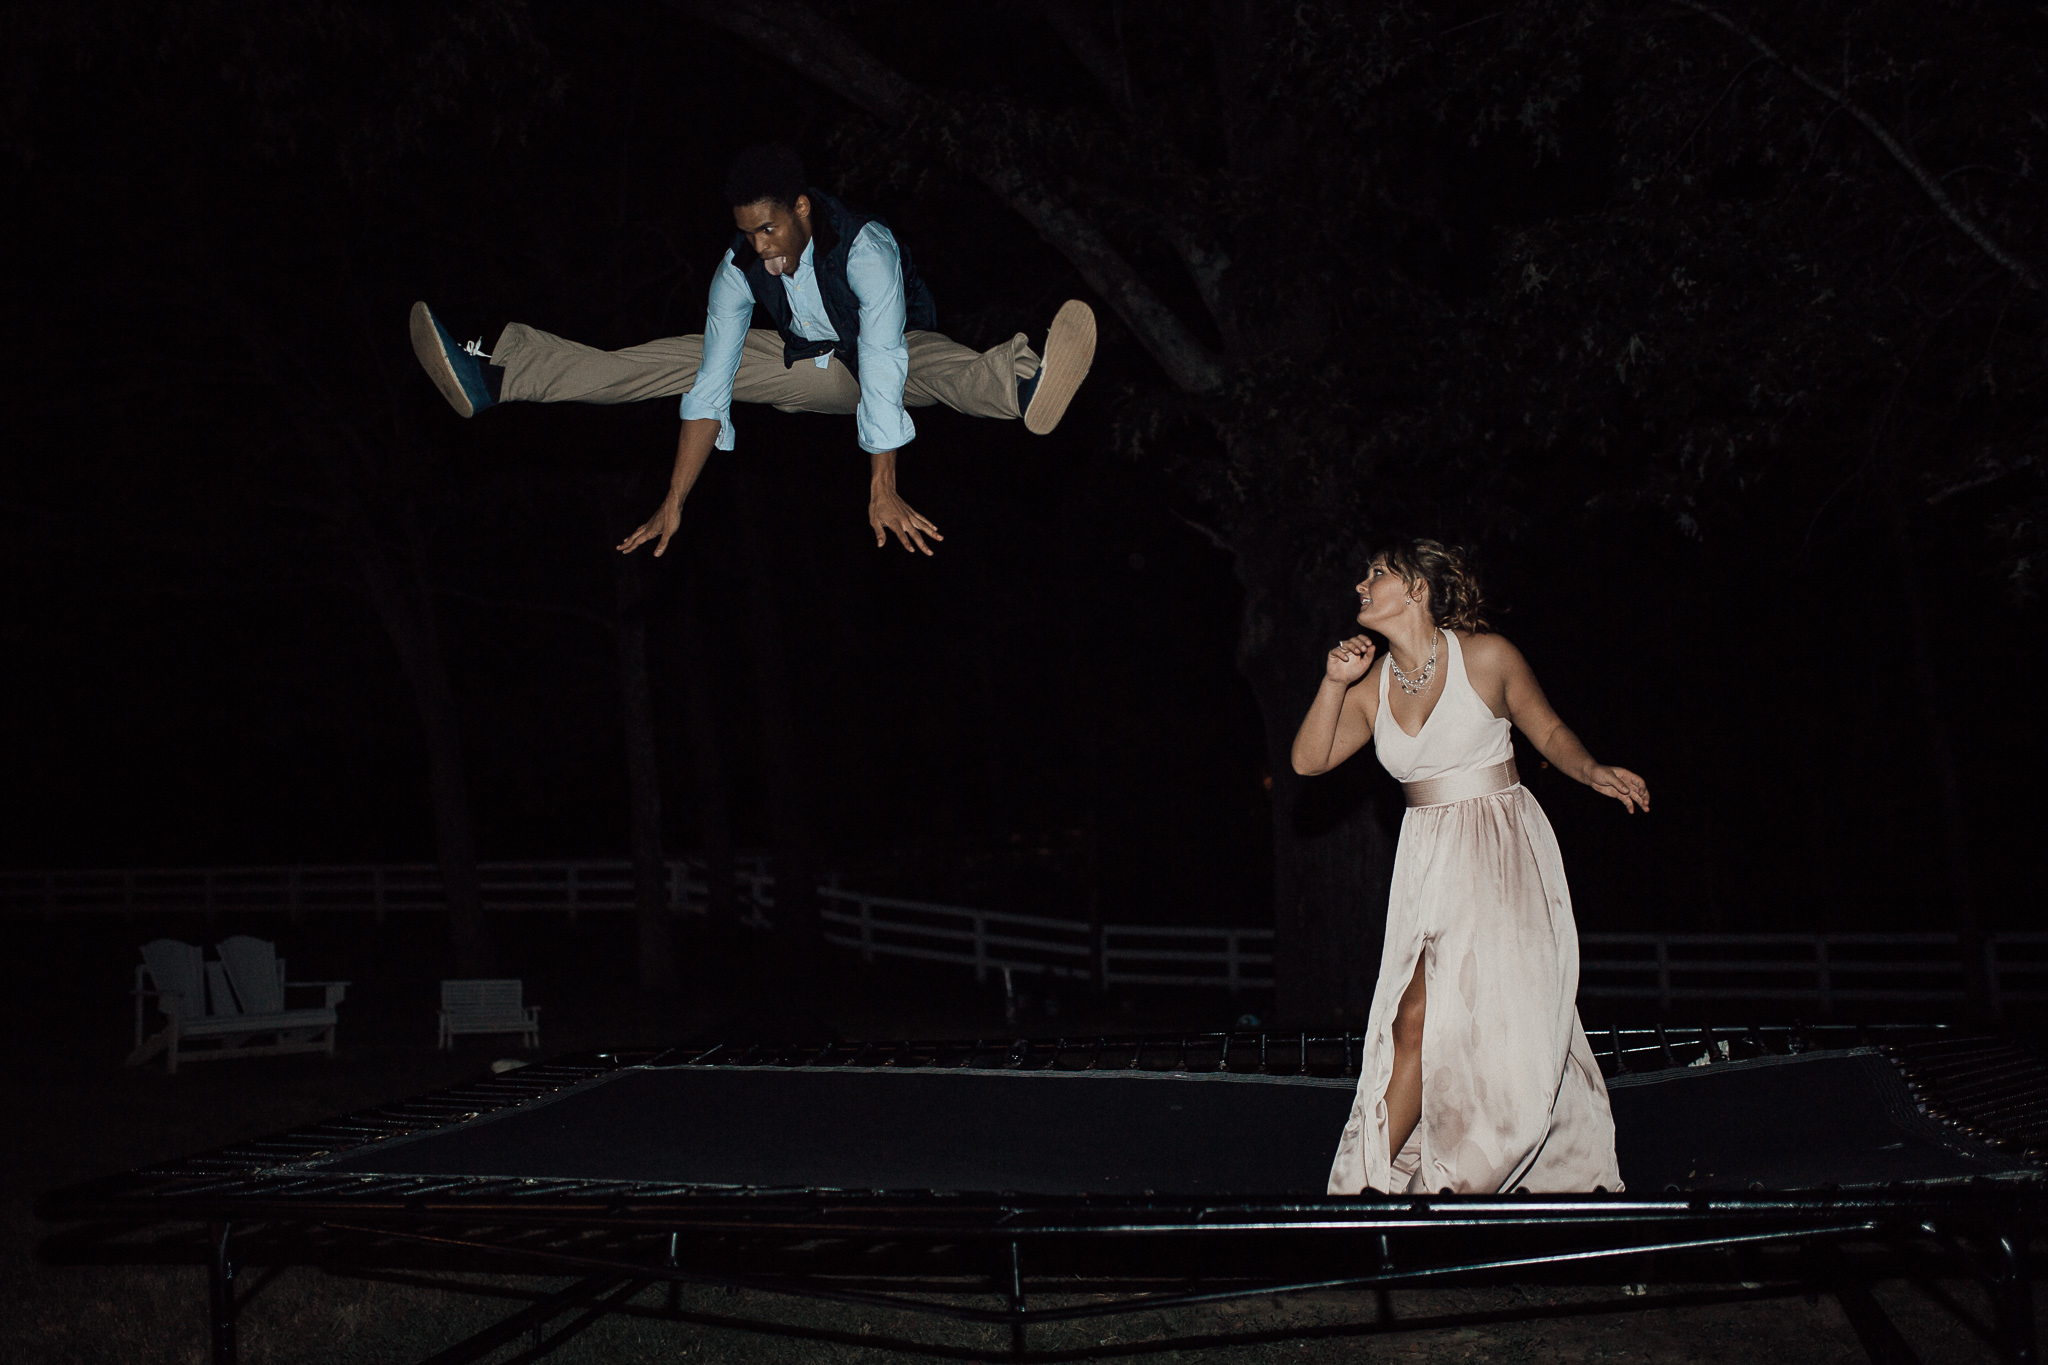 cassie-cook-photography-hernando-wedding-venue-memphis-wedding-photographer-cassie-cook-photography